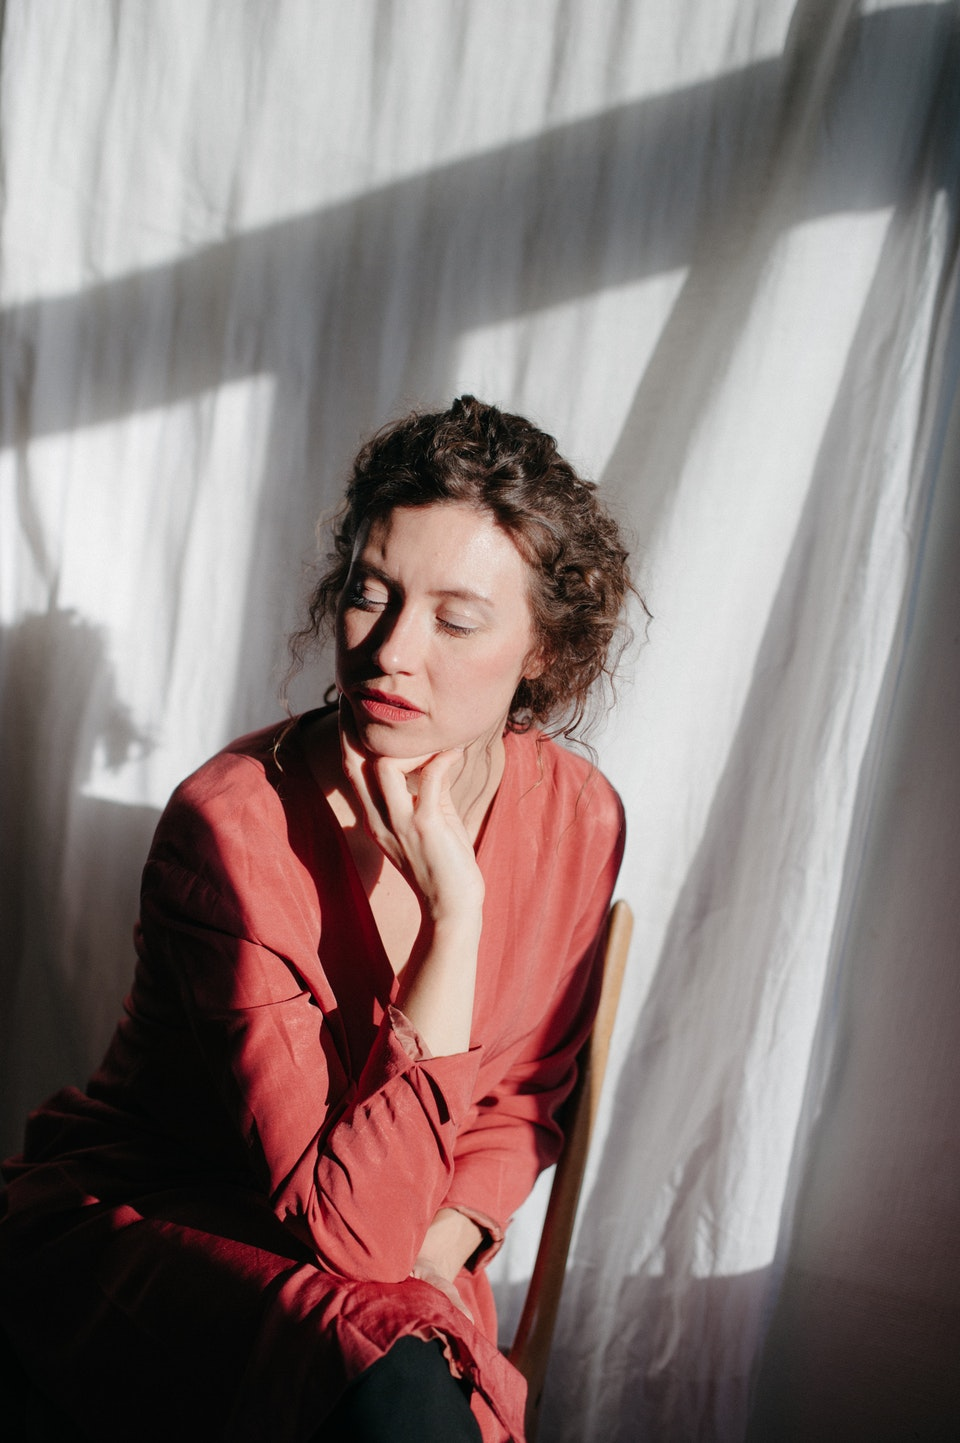 Portraits - Therése Thylin, Opera singer